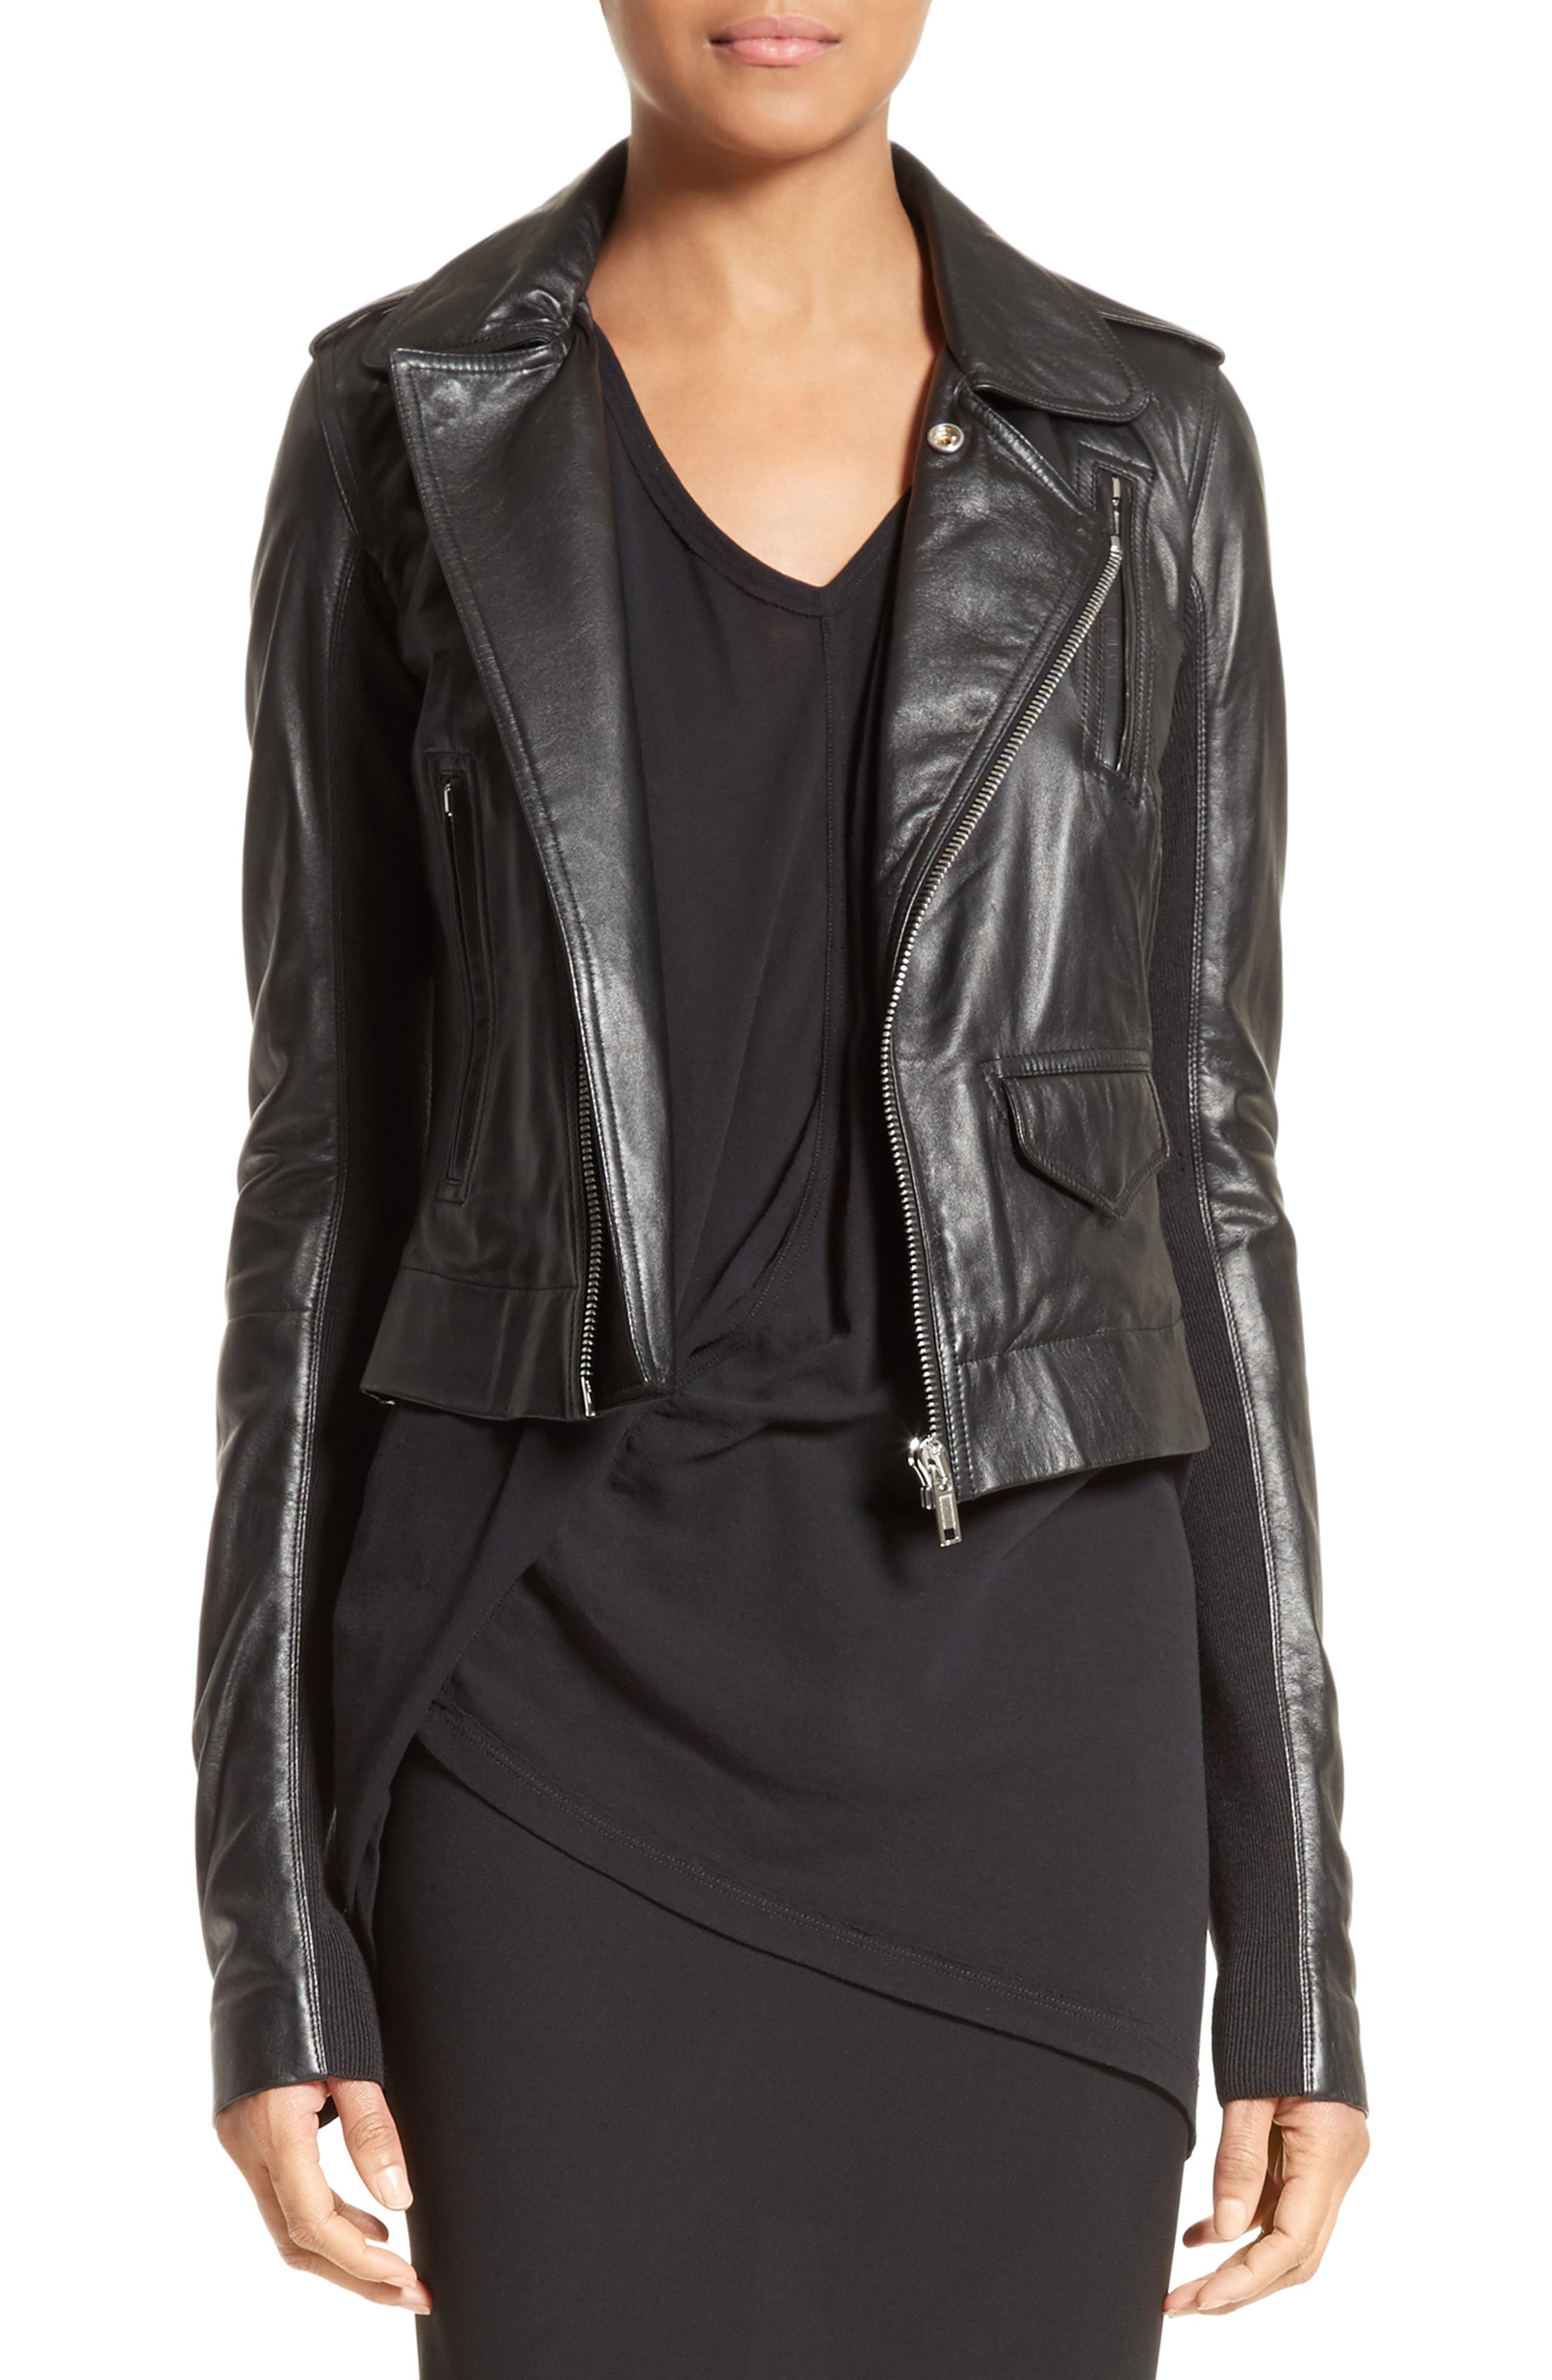 Rick Owens Stooges Leather Jacket